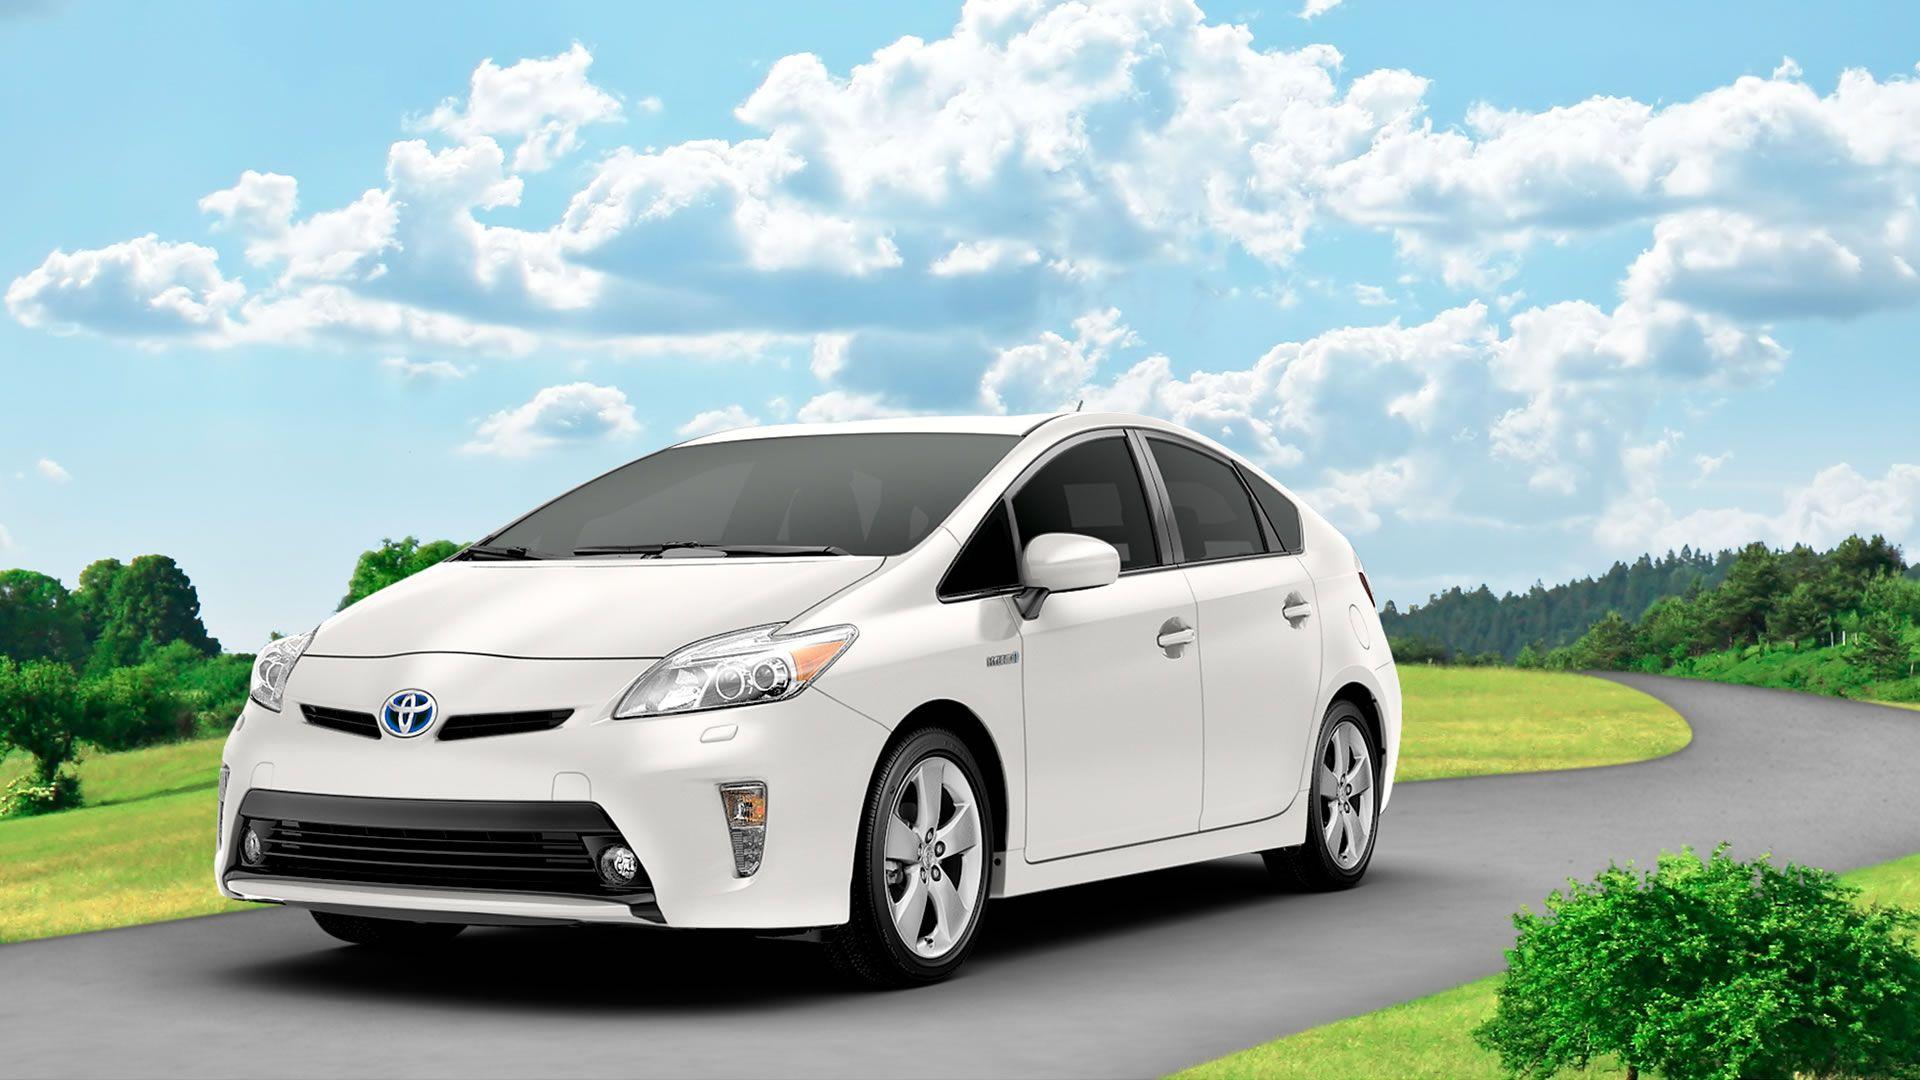 2015 Toyota Prius Diff 2 3 4 5 Toyota Prius Toyota Car